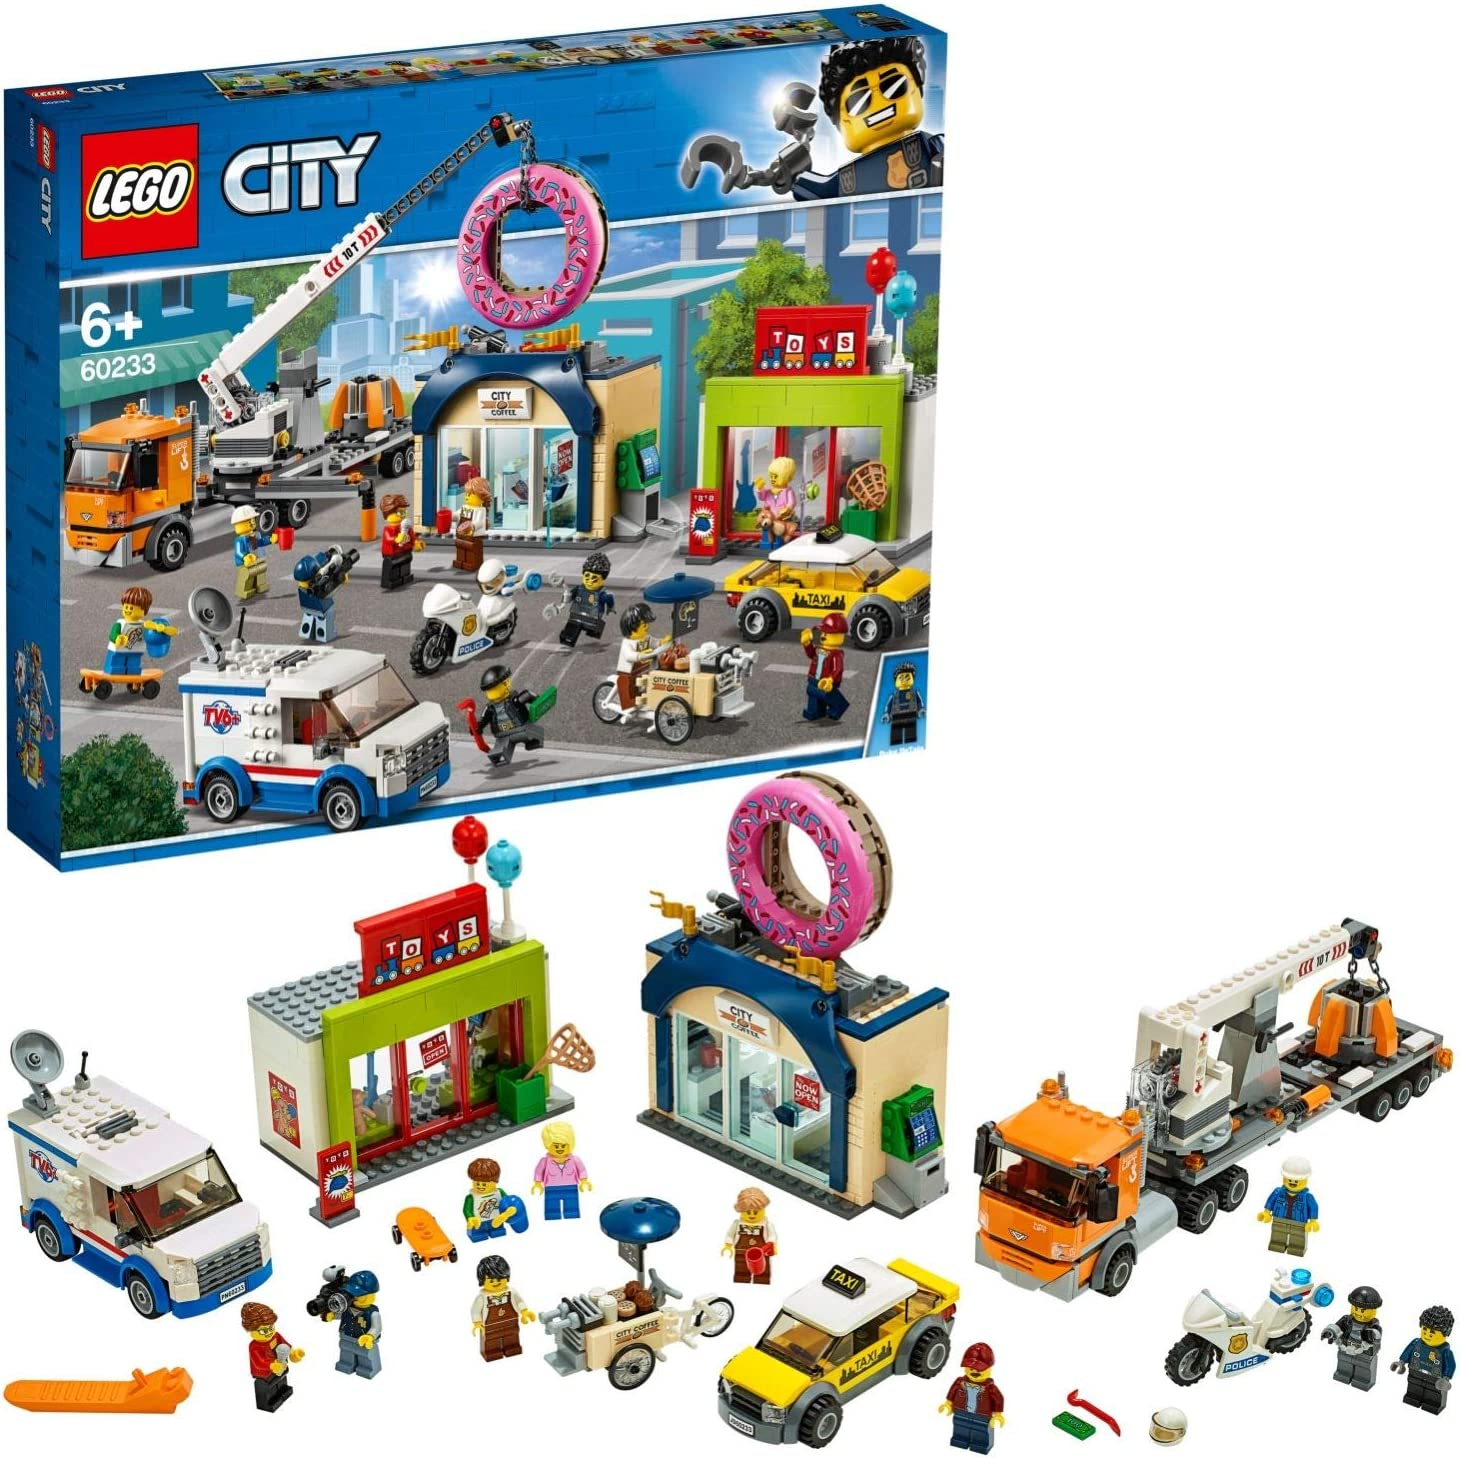 LEGO® City Town Minifigur Großmutter mit Kaffee aus dem Set 60234